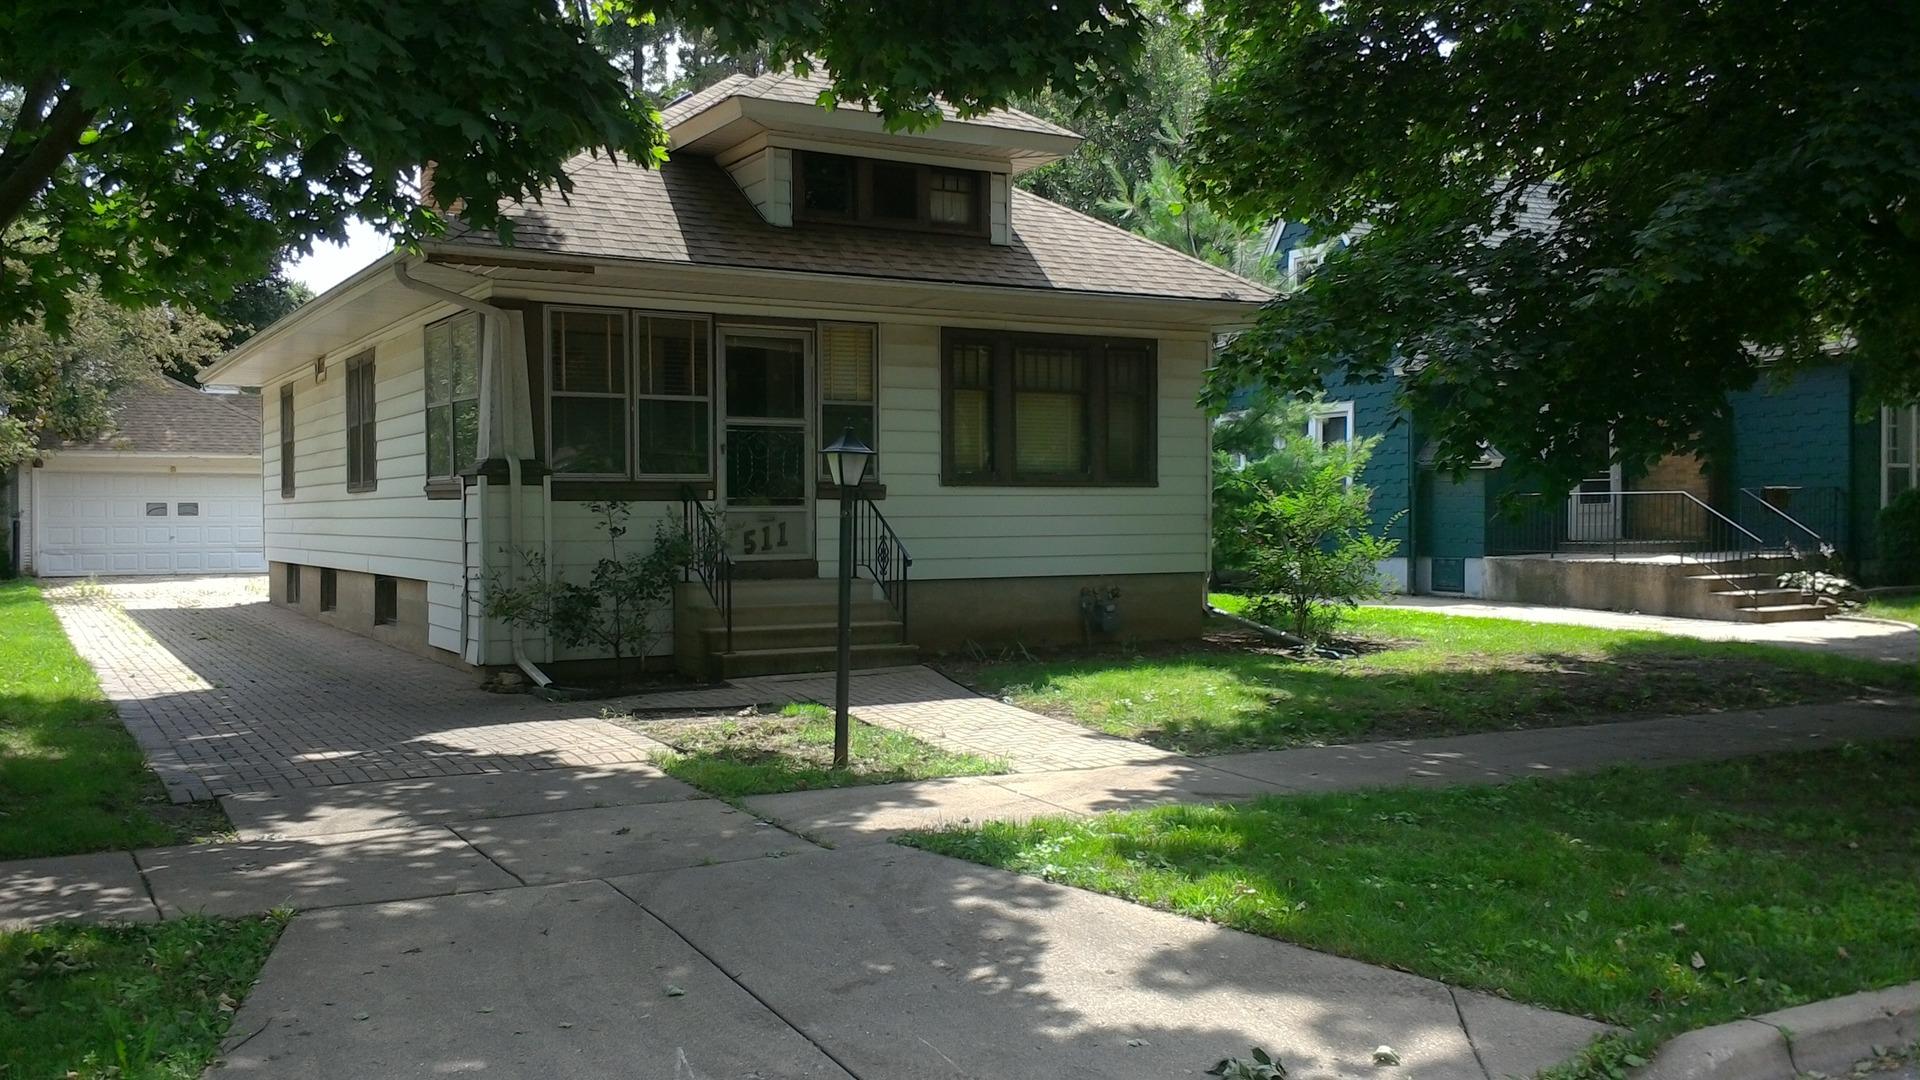 Photo of 511 WILBER Street  ELGIN  IL